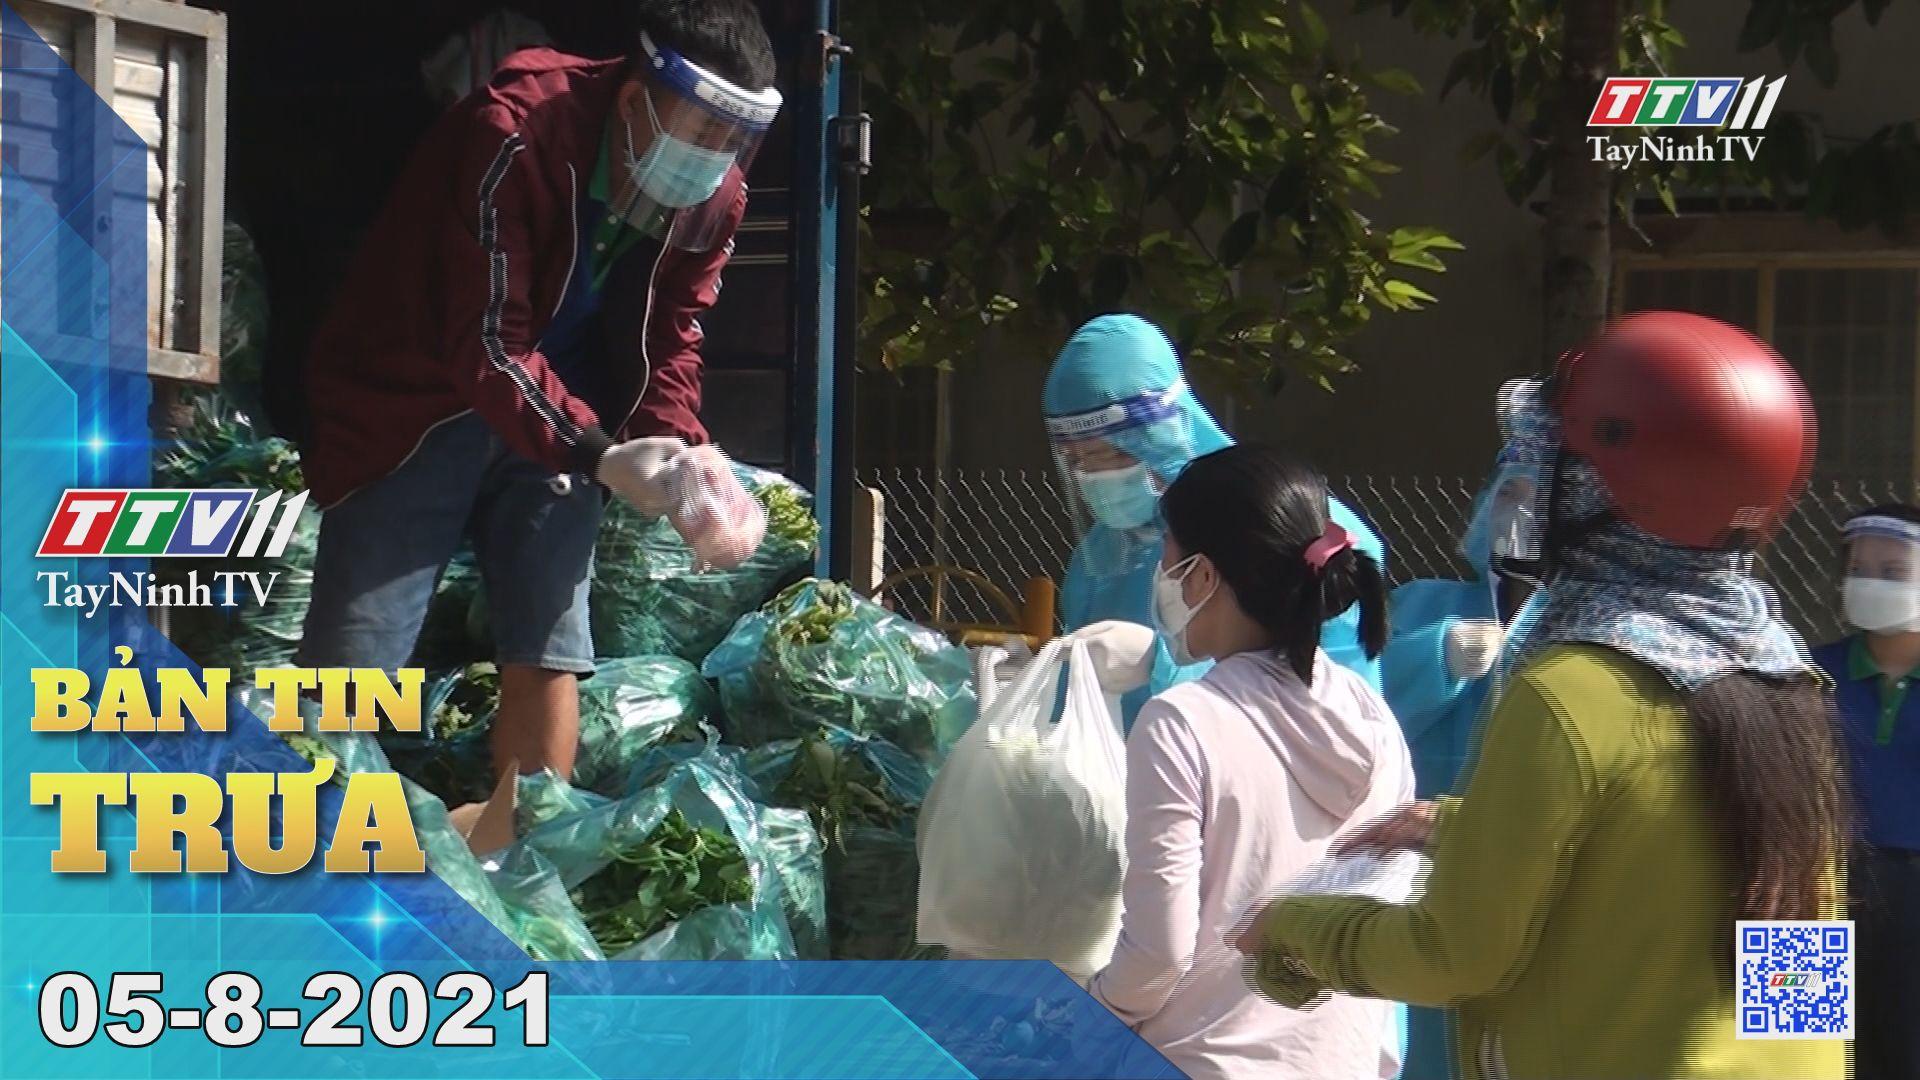 Bản tin trưa 05-8-2021 | Tin tức hôm nay | TayNinhTV